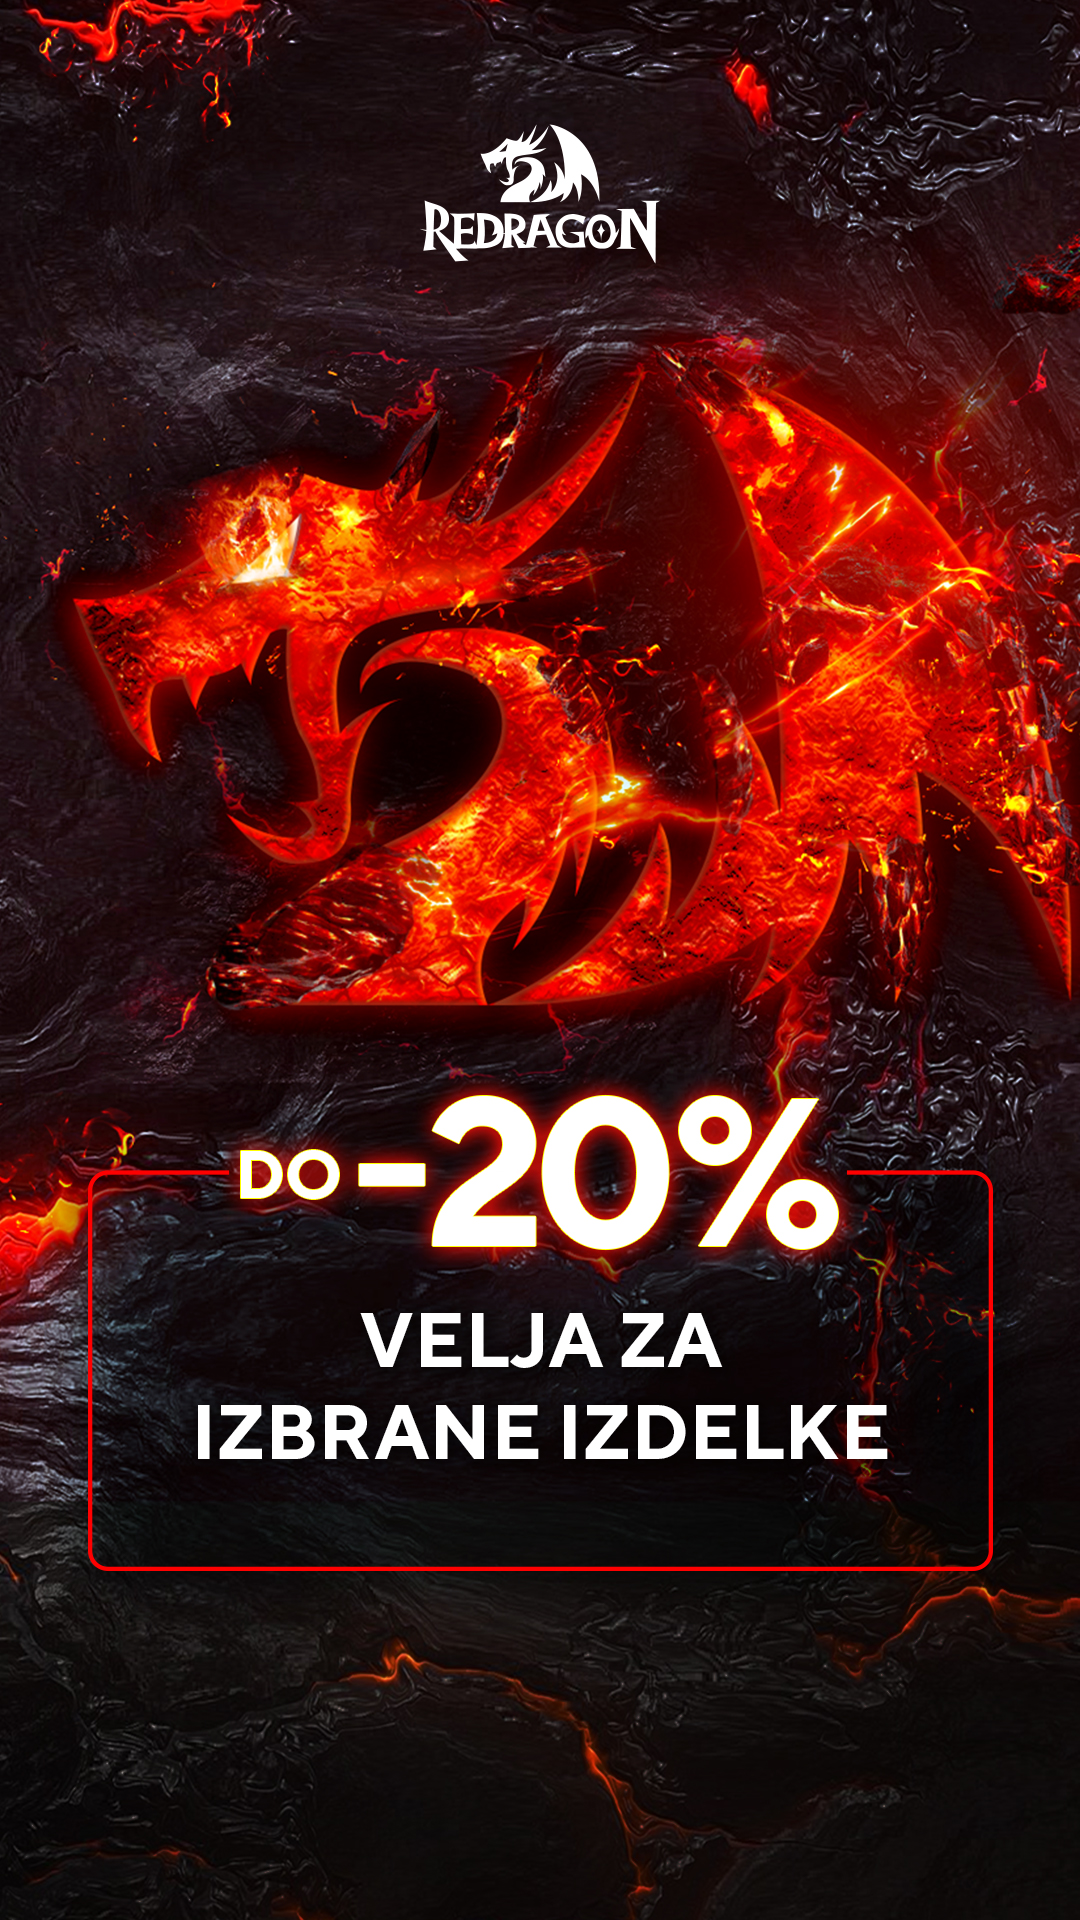 IG%20Story%201080x1920.jpg